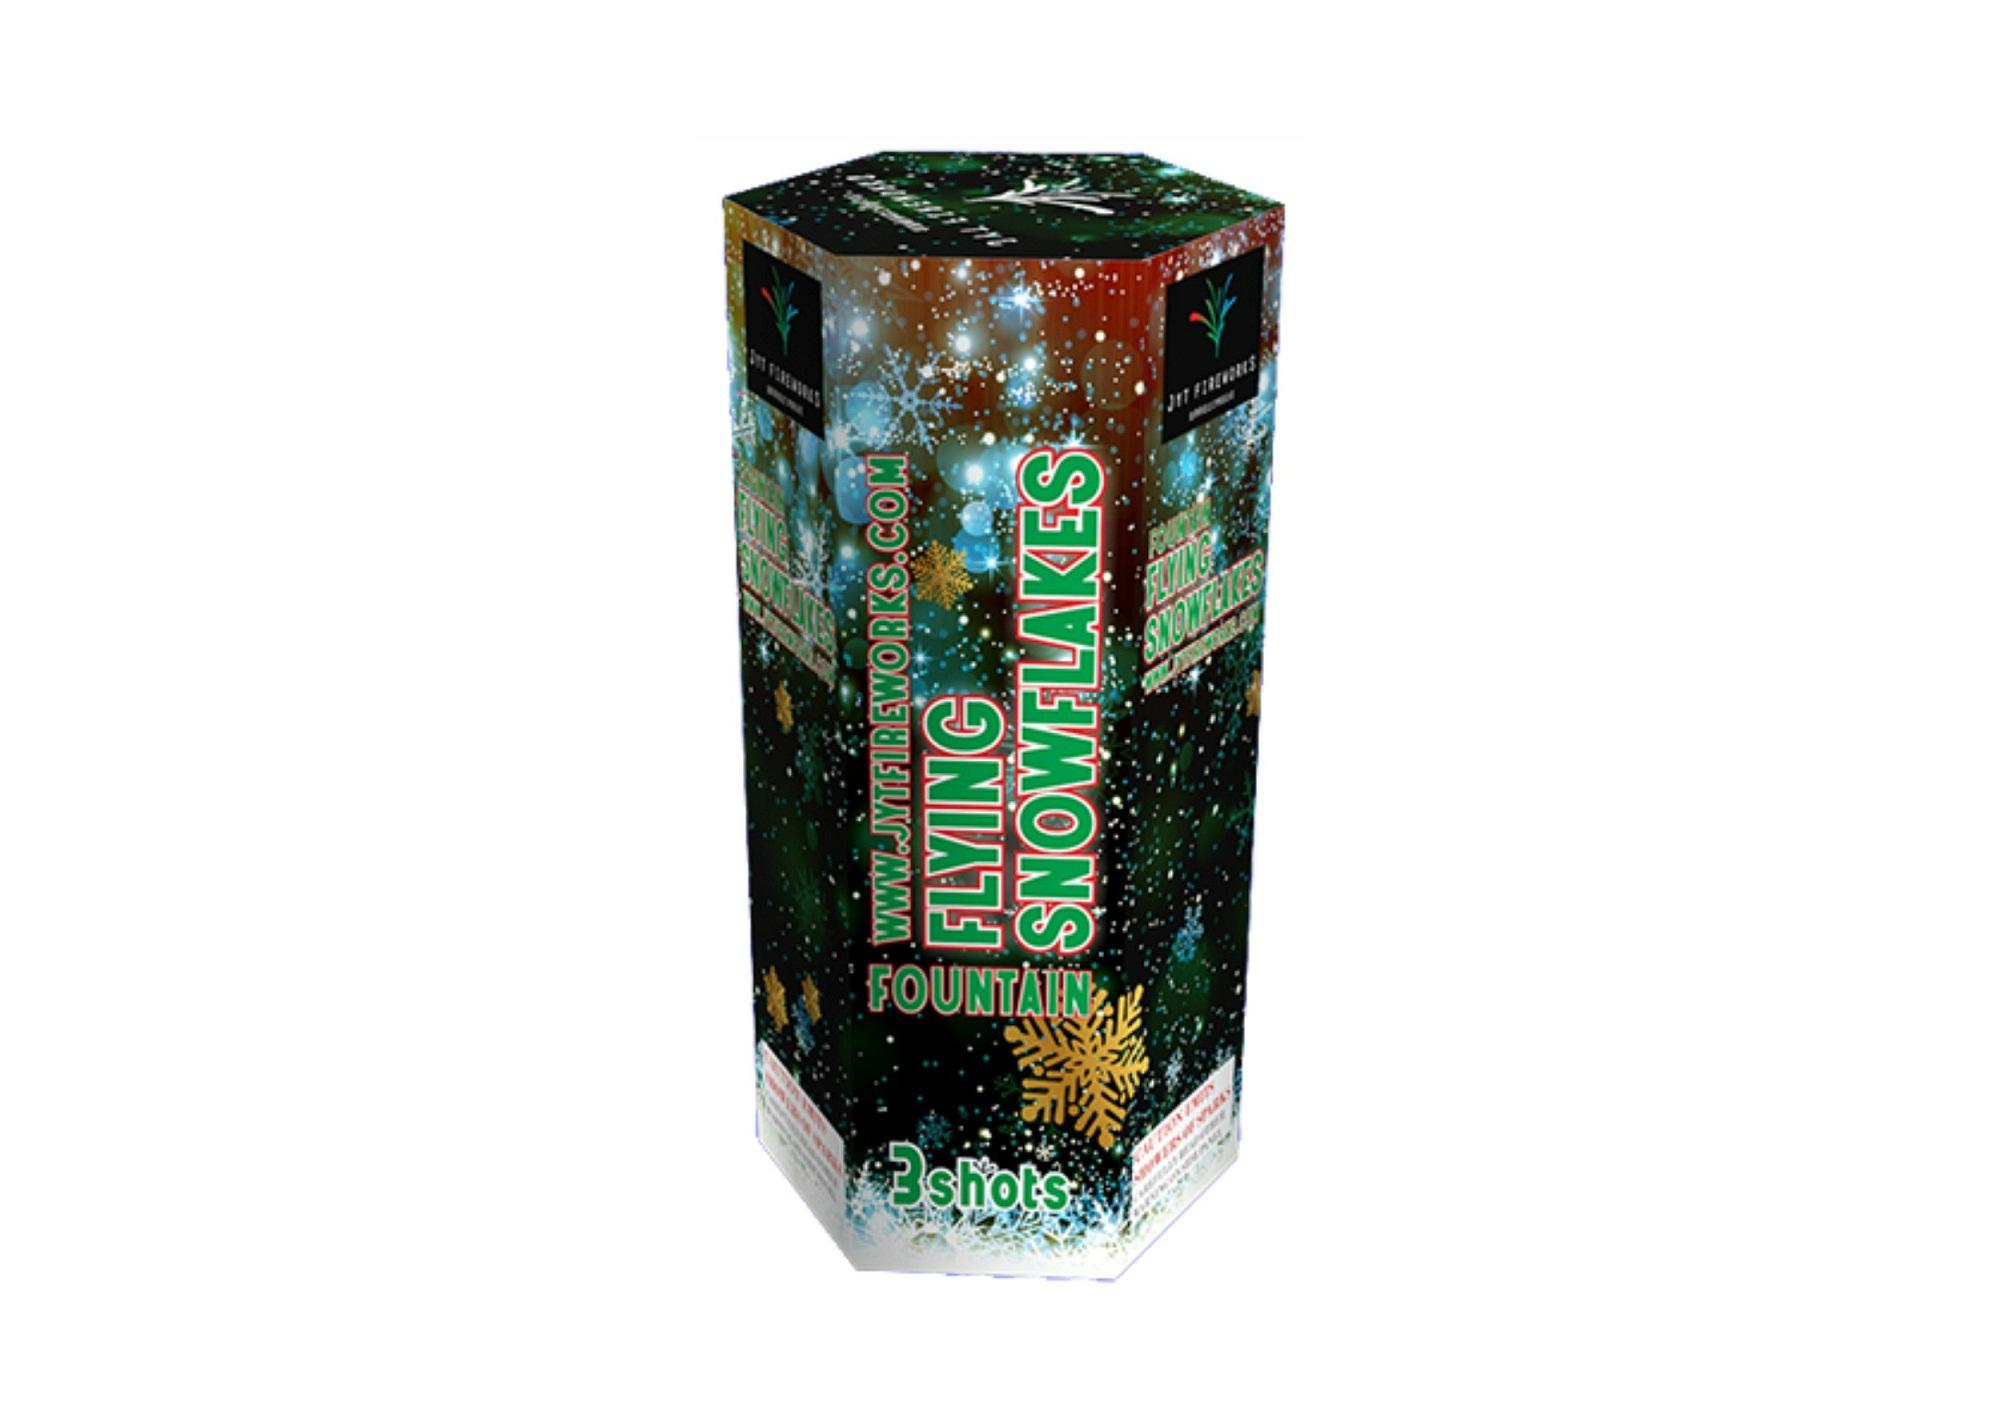 3shots Fountain (JYTA020080) Fireworks 1